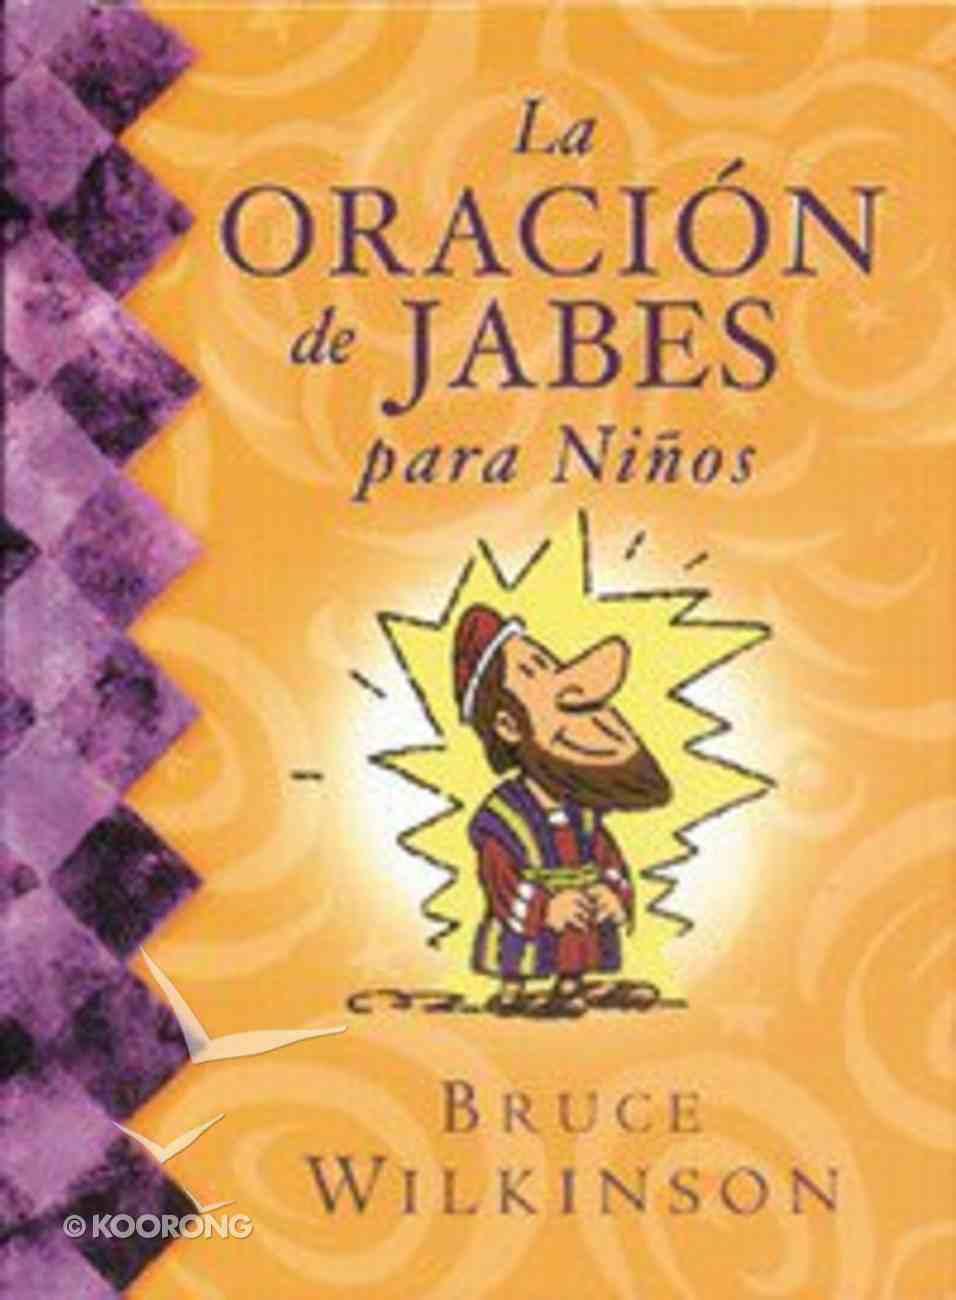 La Oracion De Jabes Para Ninos (Prayer of Jabez For Kids) (#01 in Breakthrough For Kids Series) Paperback